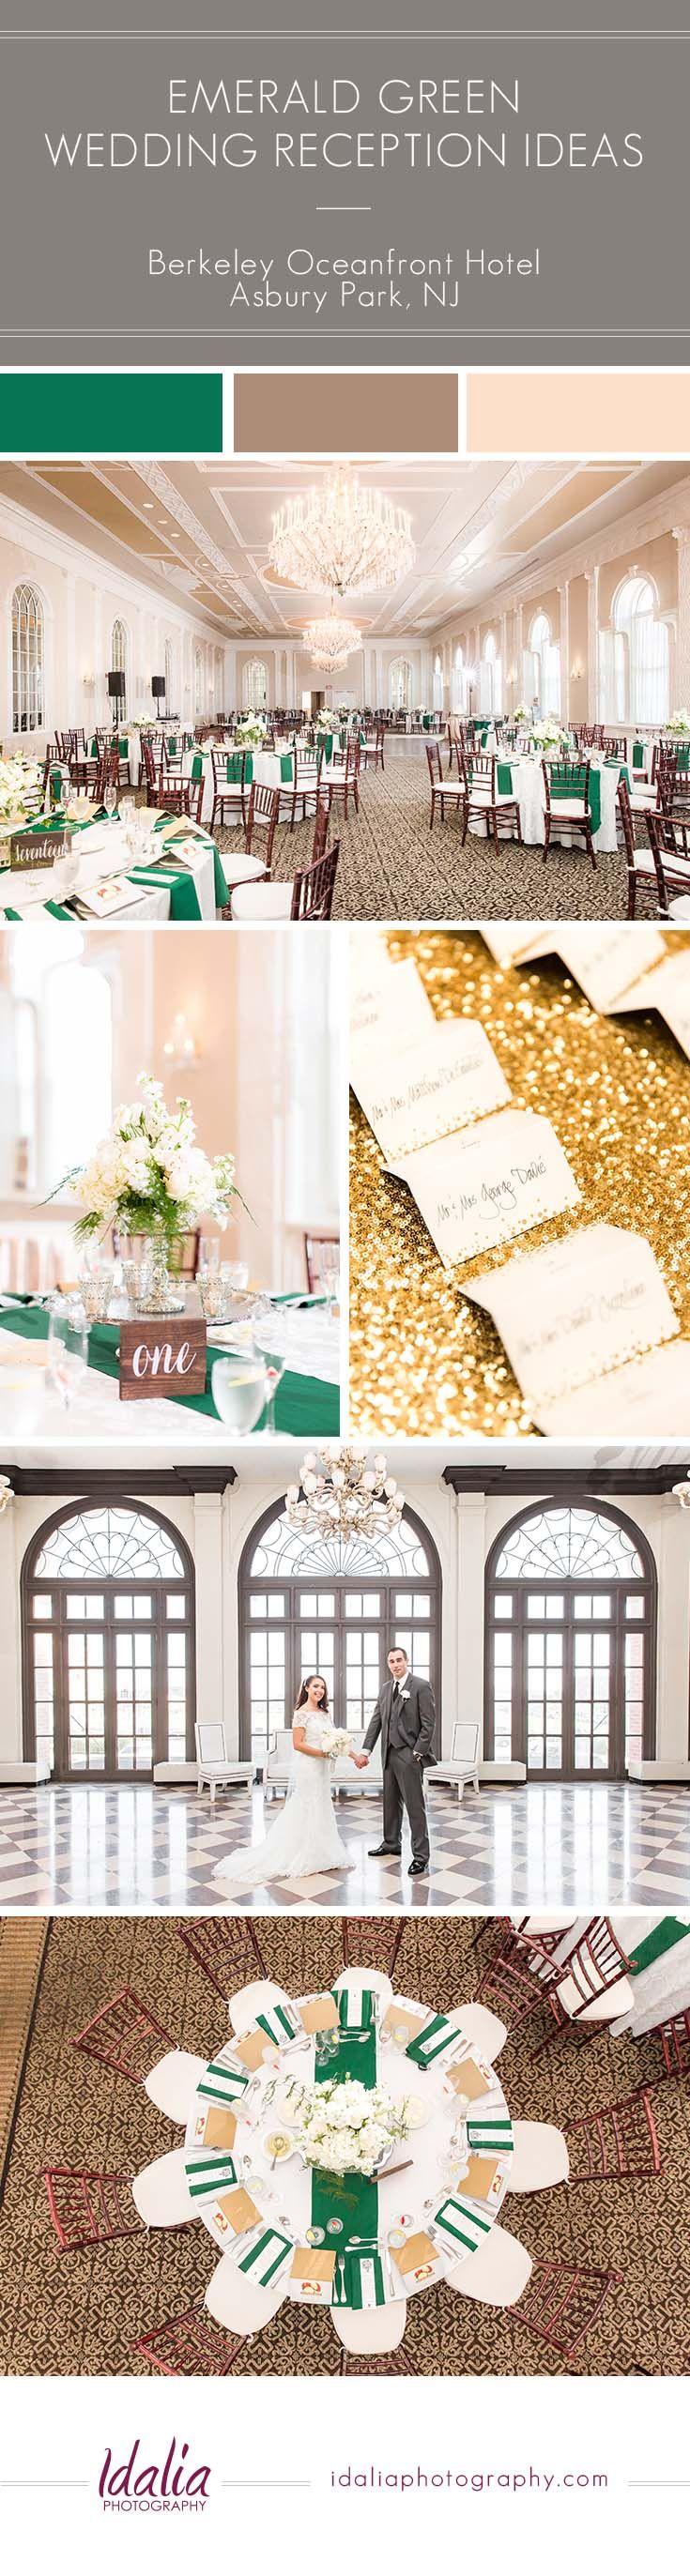 wedding venues asbury park nj%0A Berkeley Oceanfront Hotel Wedding Emerald Reception Ideas   Photo by Idalia  Photography